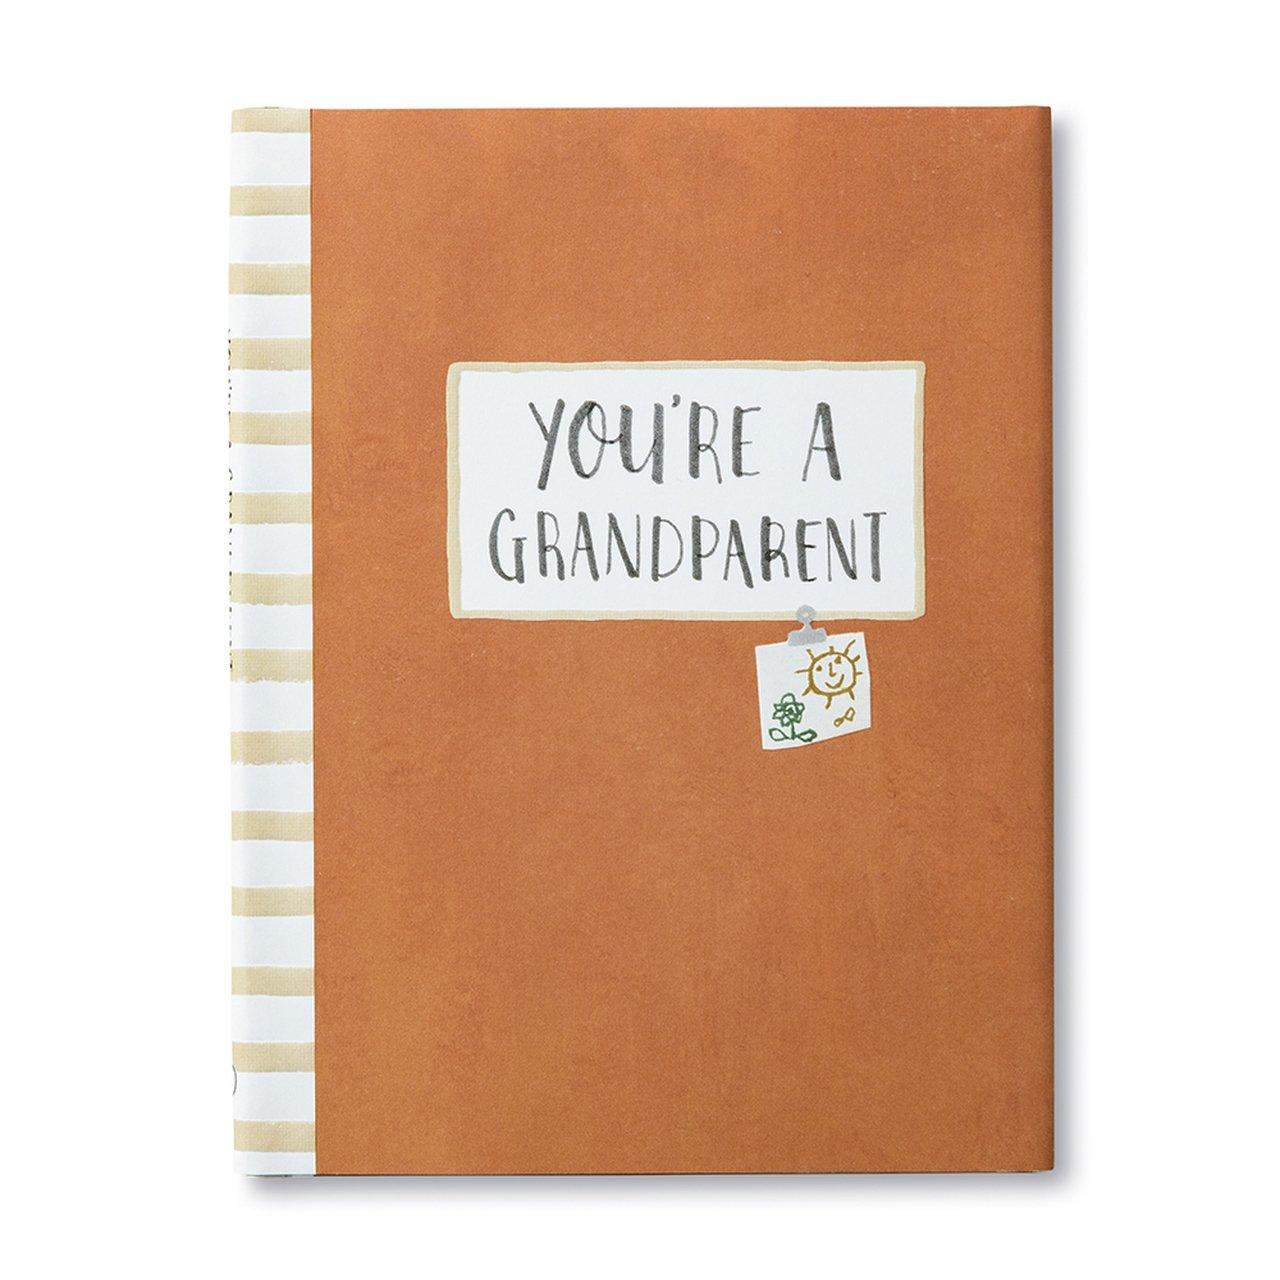 You're A Grandparent